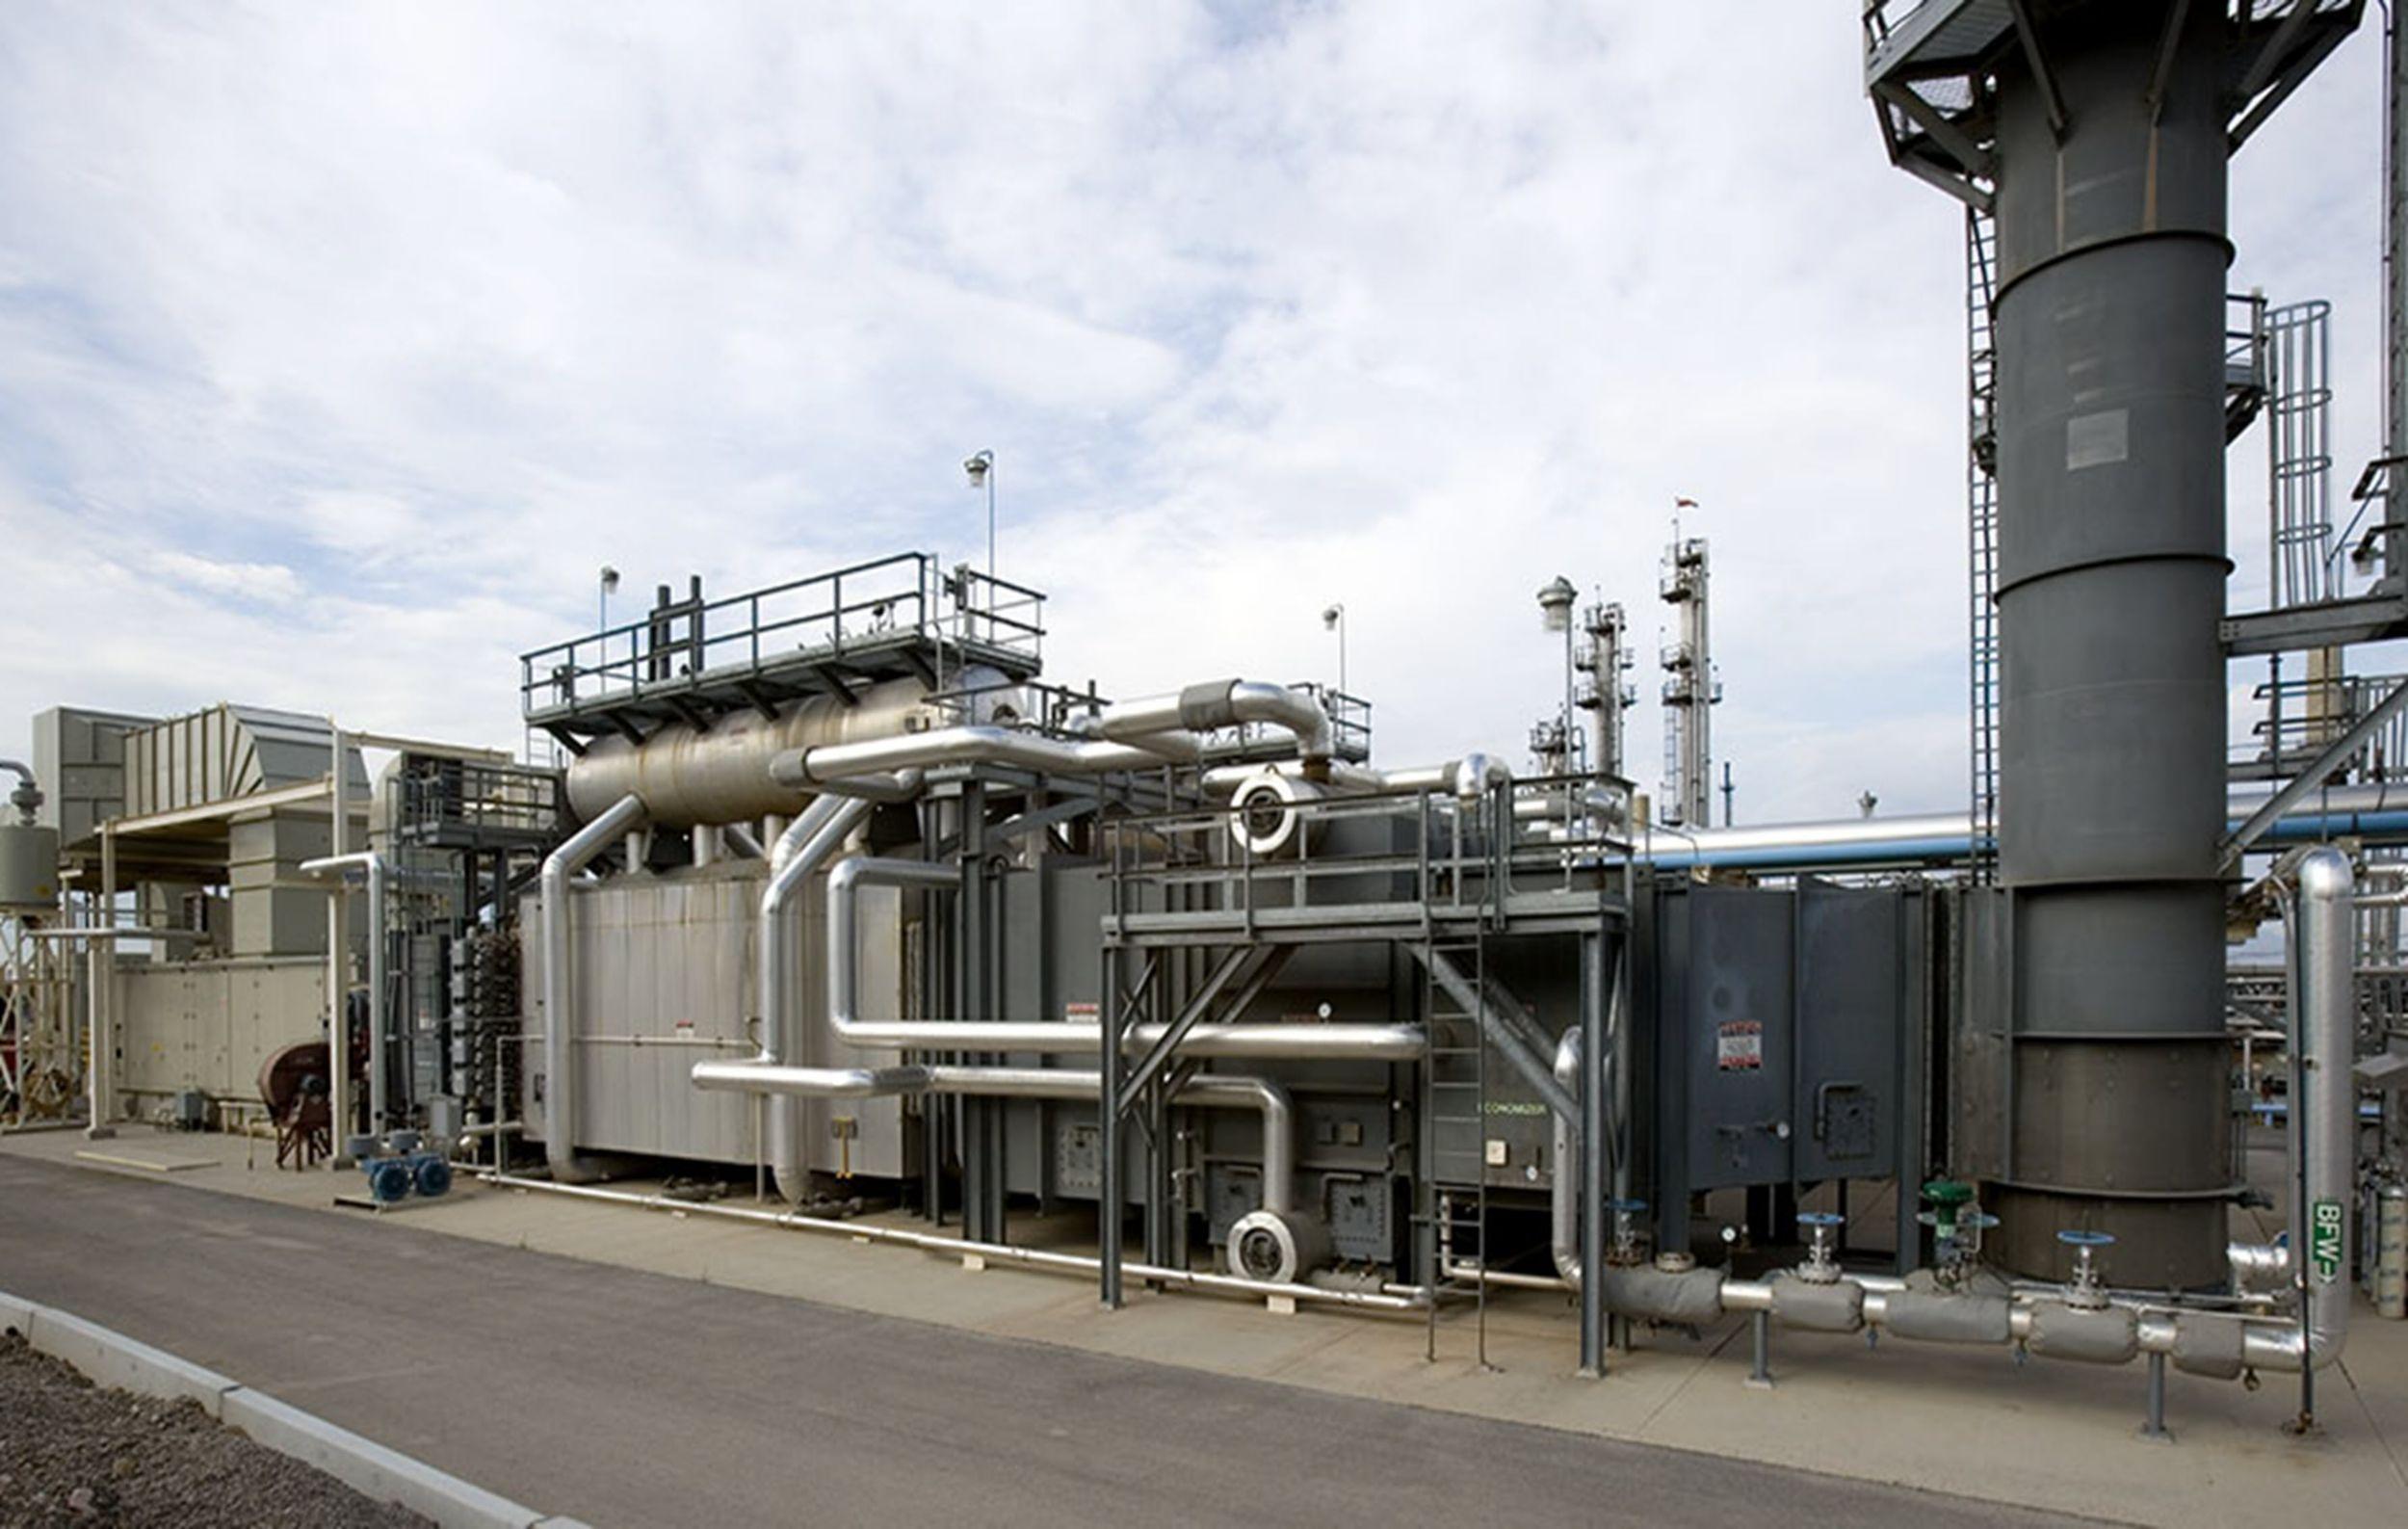 Solar Turbines 将在法国戛纳举行的欧洲炼油技术会议 (ERTC) 上展示炼油厂的经验